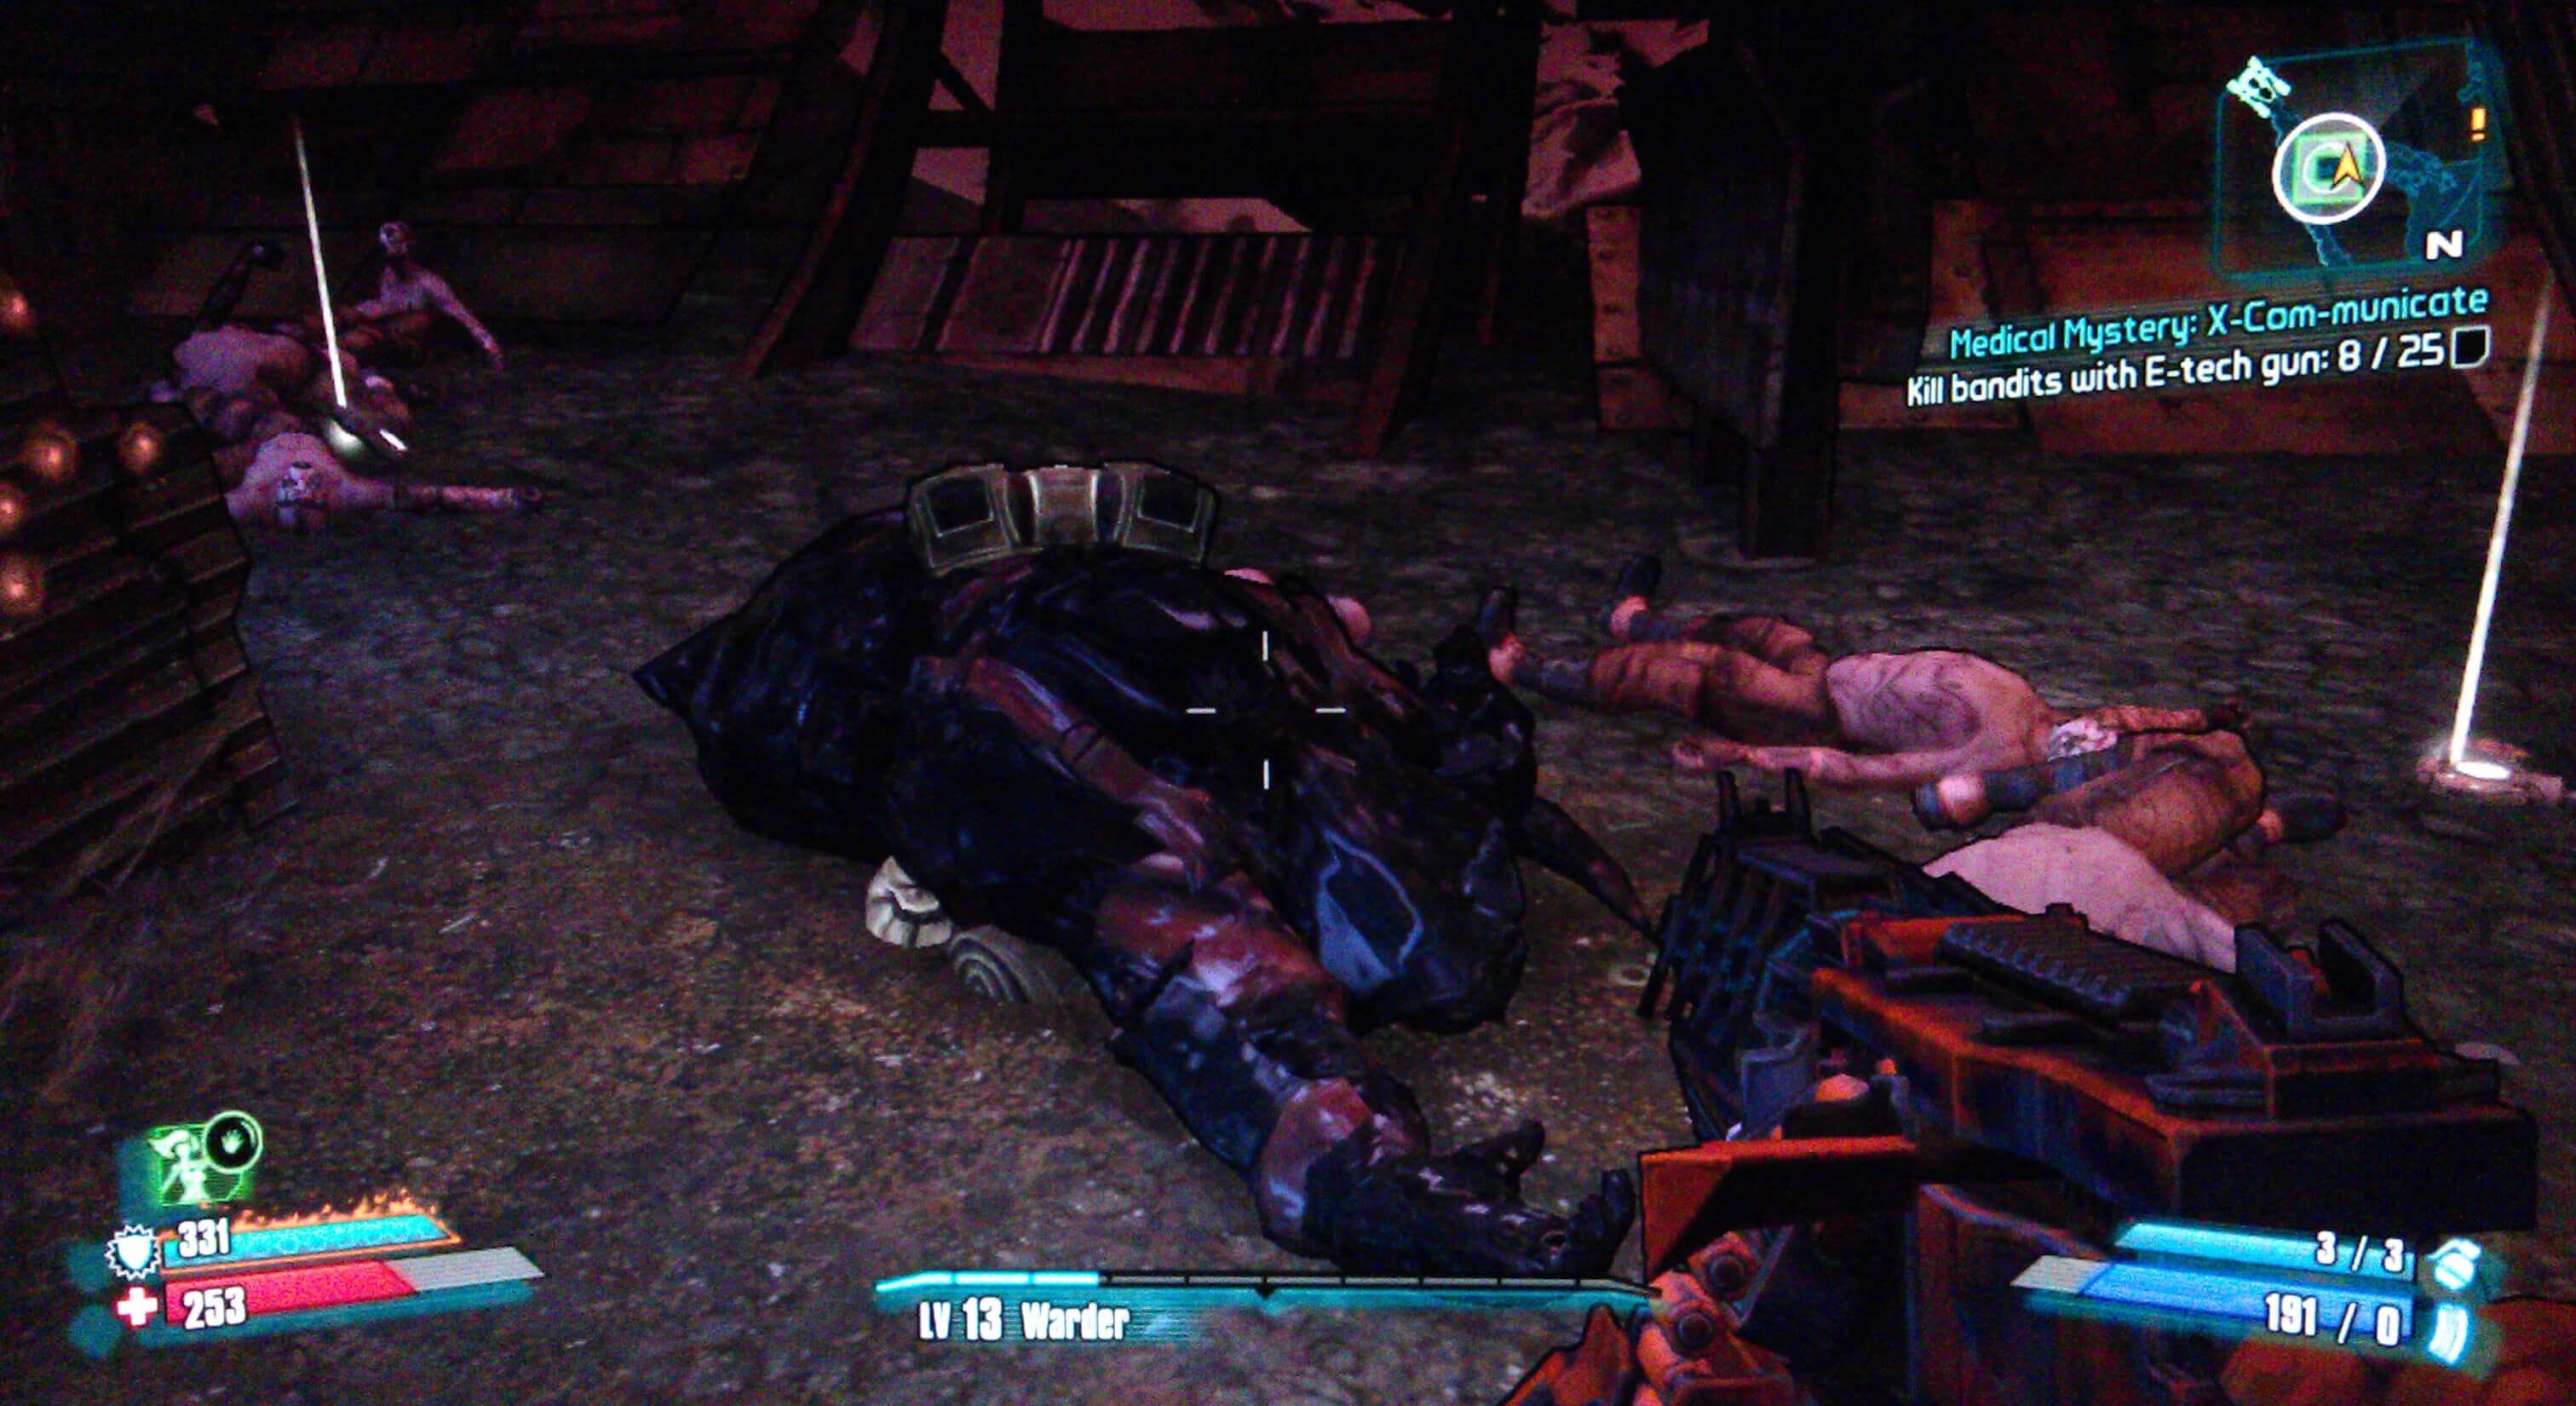 Borderlands 2 Medical Mystery: X-Com-municate Walkthrough